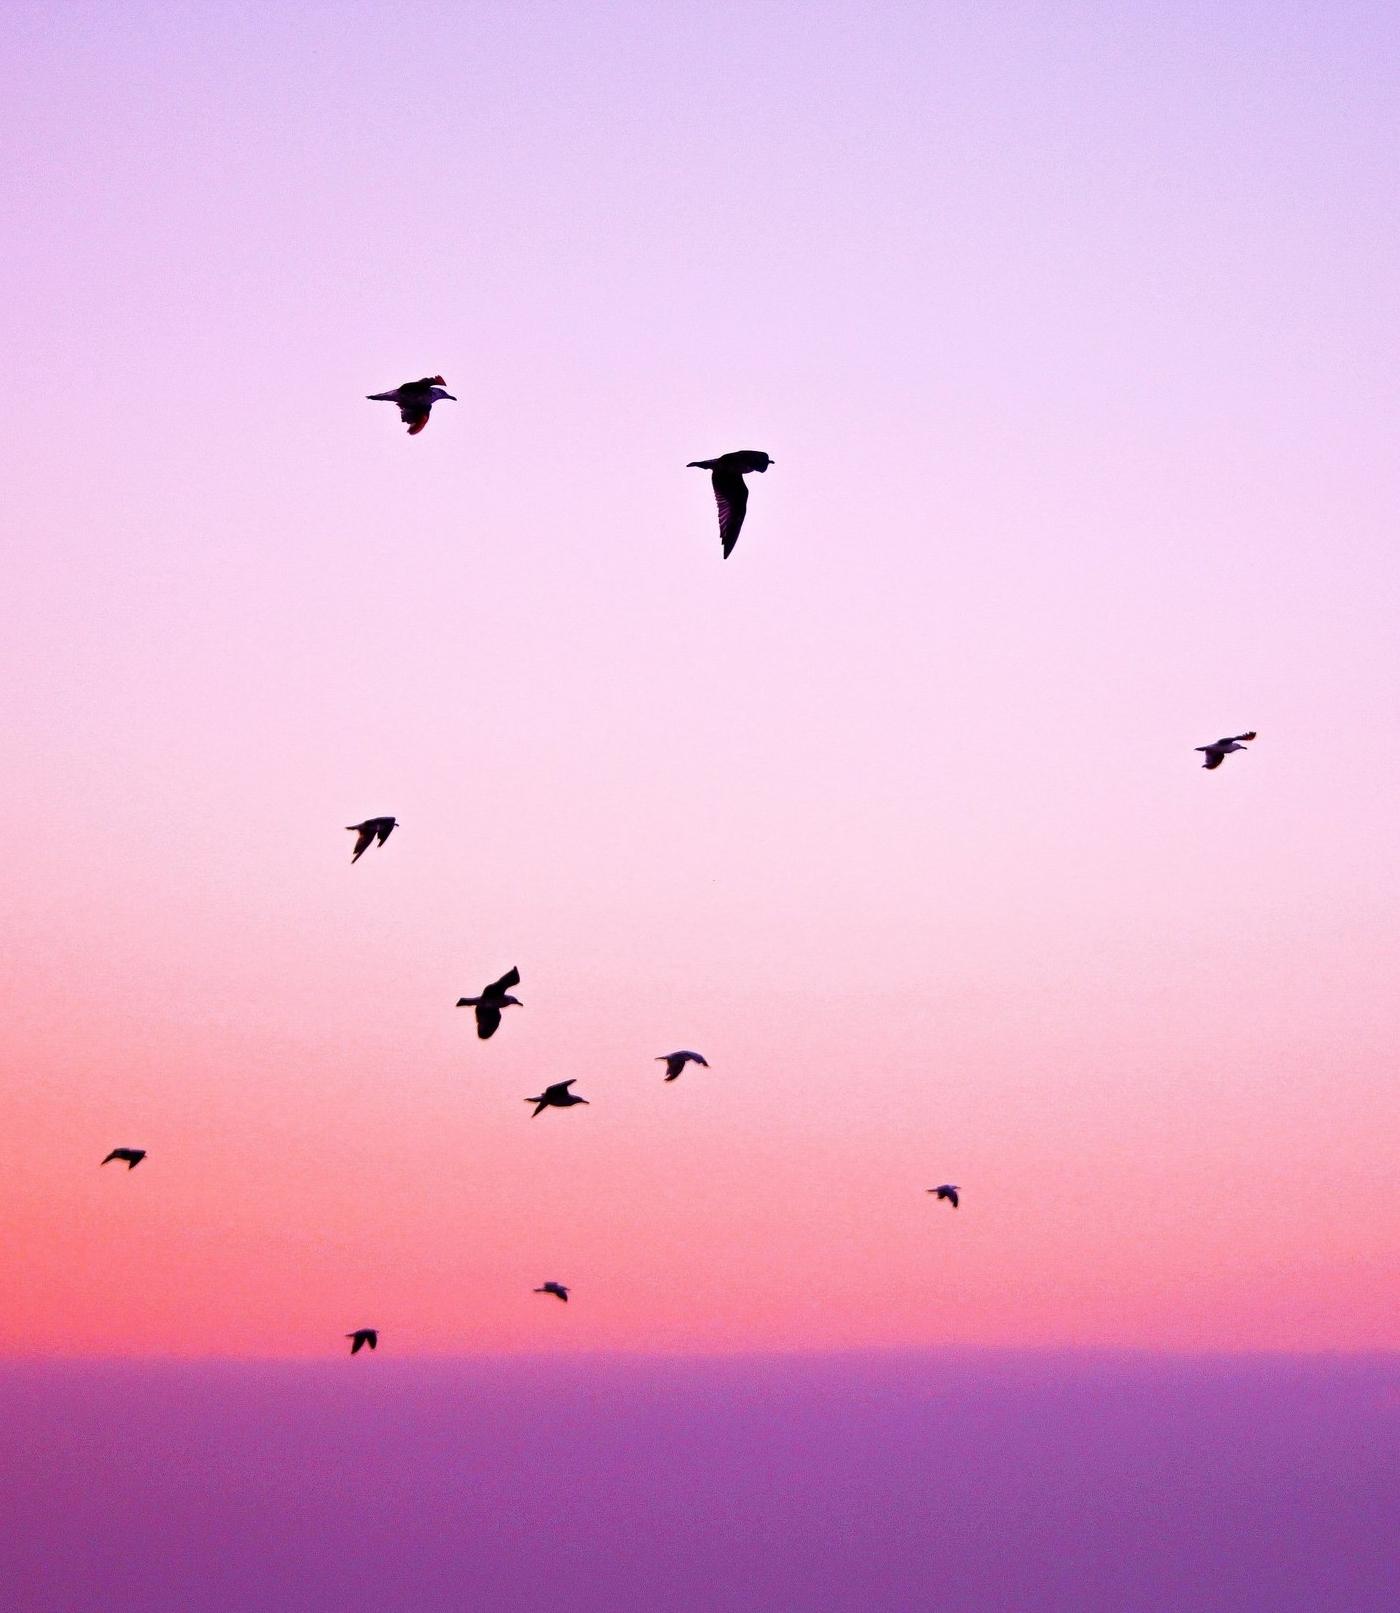 animals-birds-nature-21261.jpg